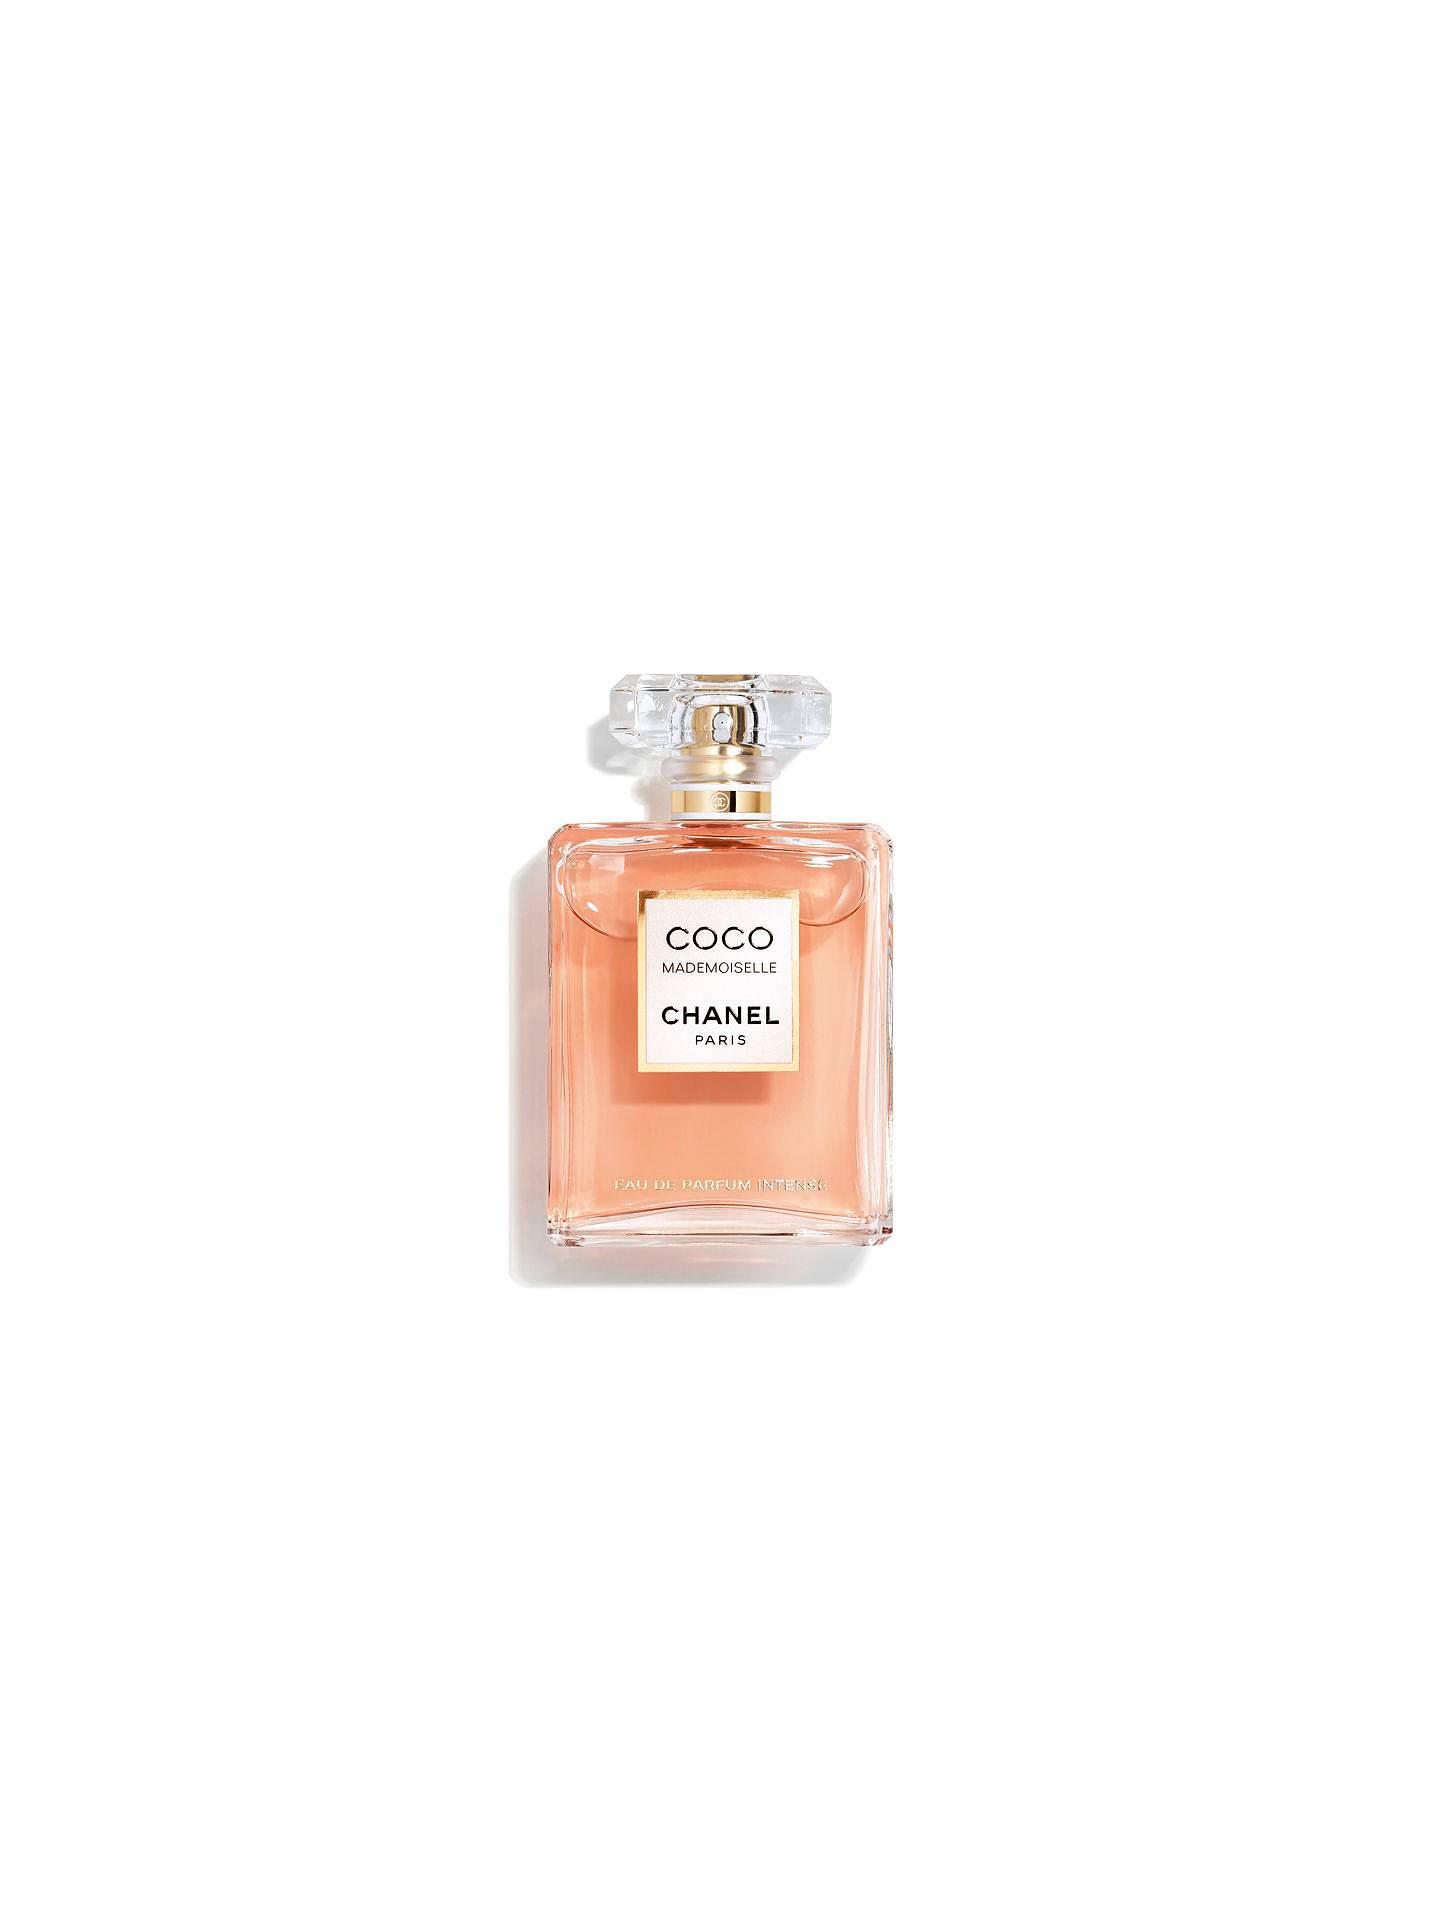 chanel coco mademoiselle eau de parfum intense spray at. Black Bedroom Furniture Sets. Home Design Ideas